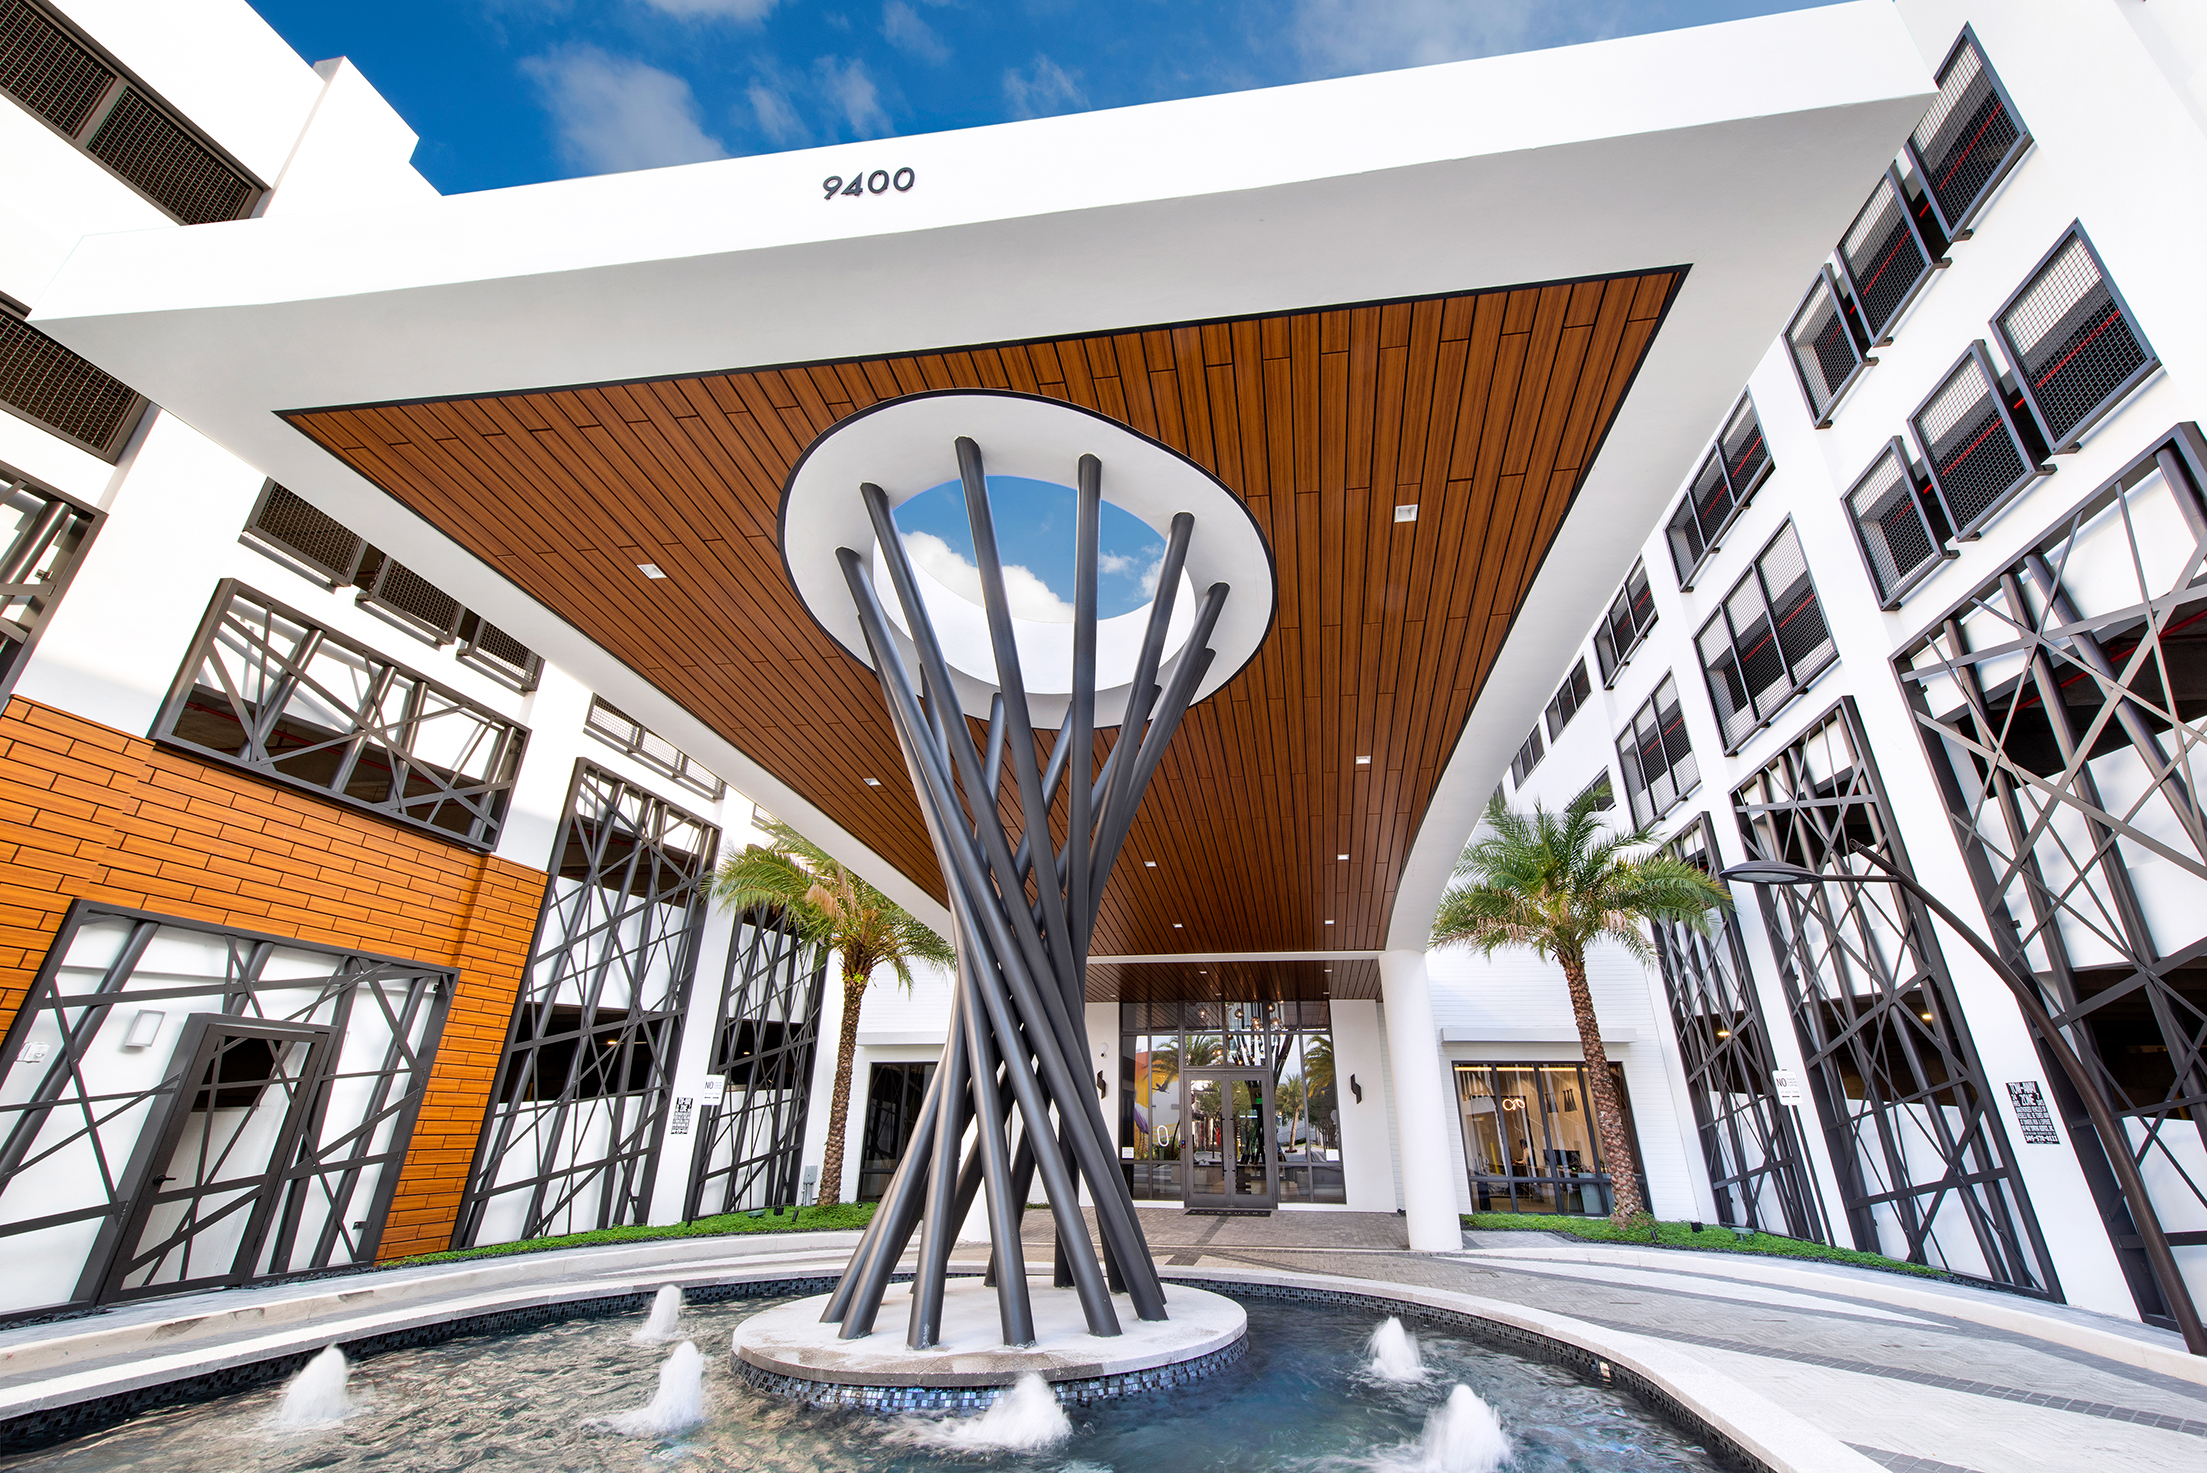 Luxury Apartment Doral for Rent: The Sanctuary Doral